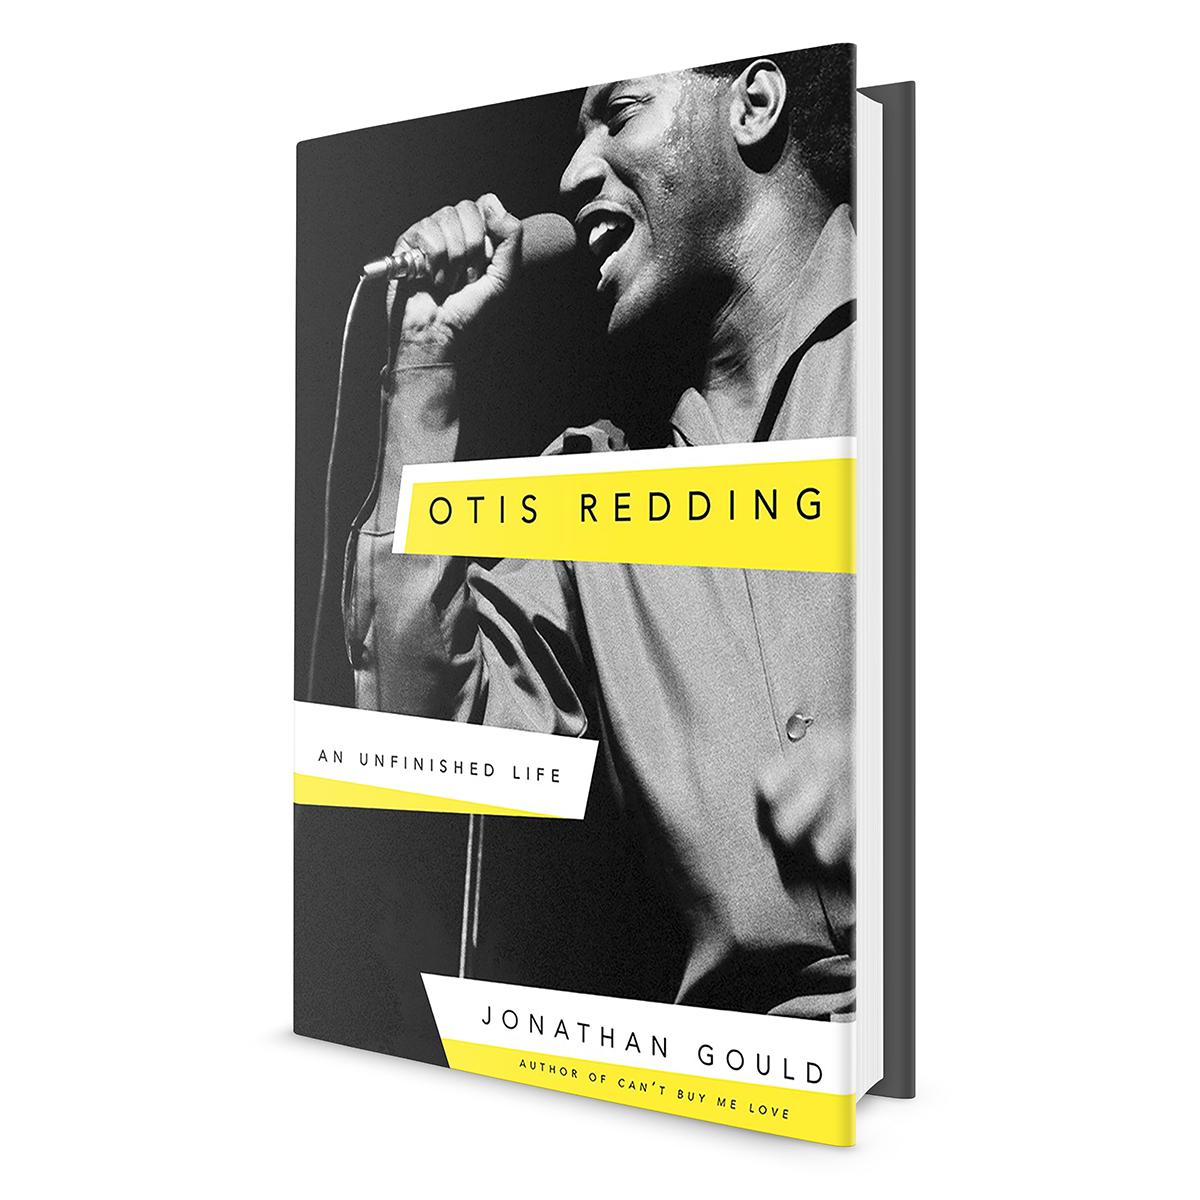 Otis Redding - An Unfinished Life Book